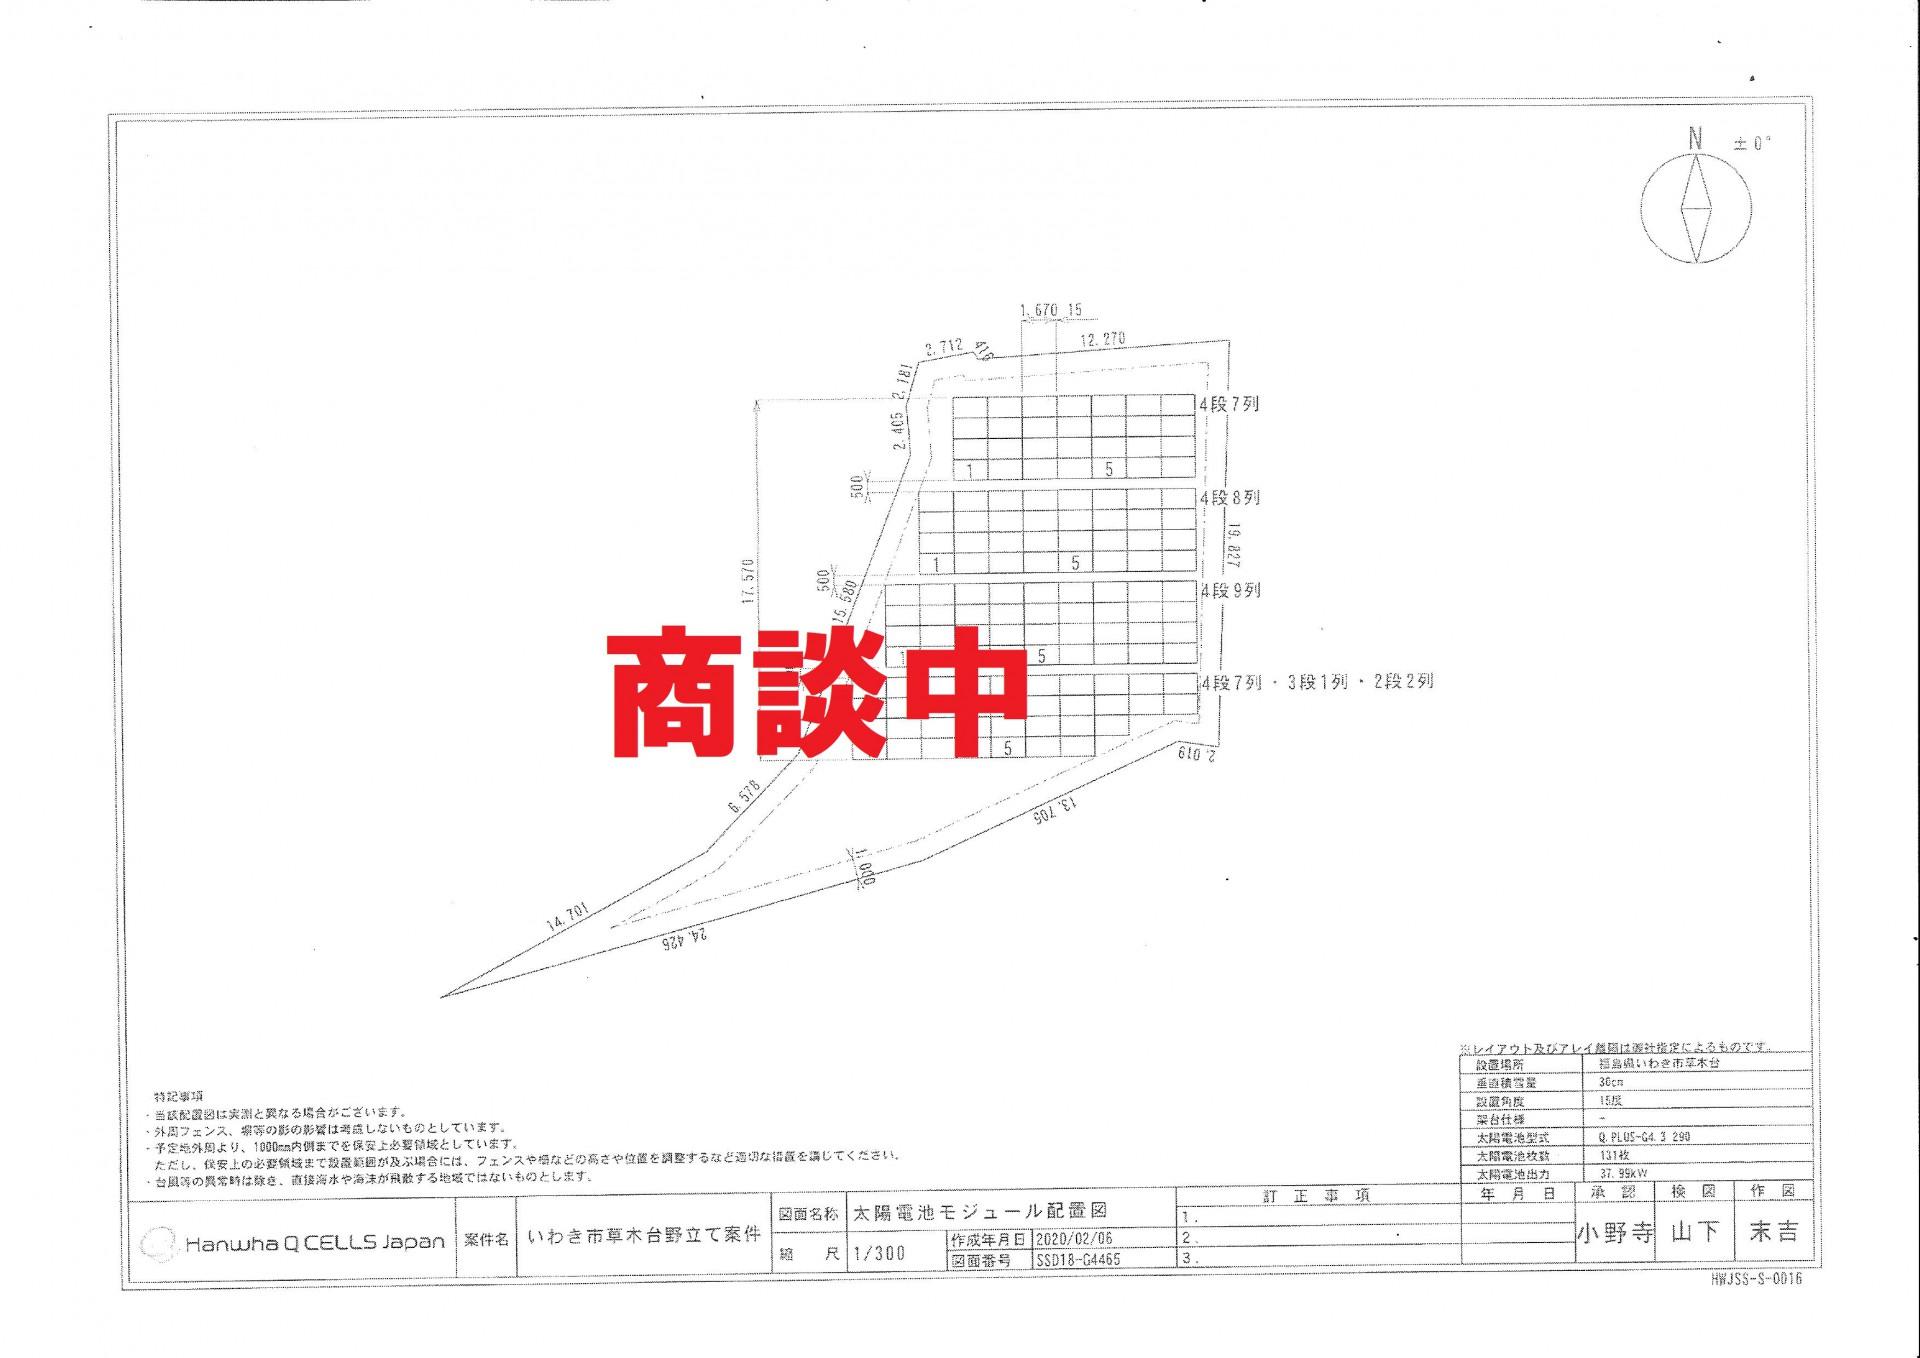 【LS】FIT27円福島県いわき草木台発電所のメイン画像